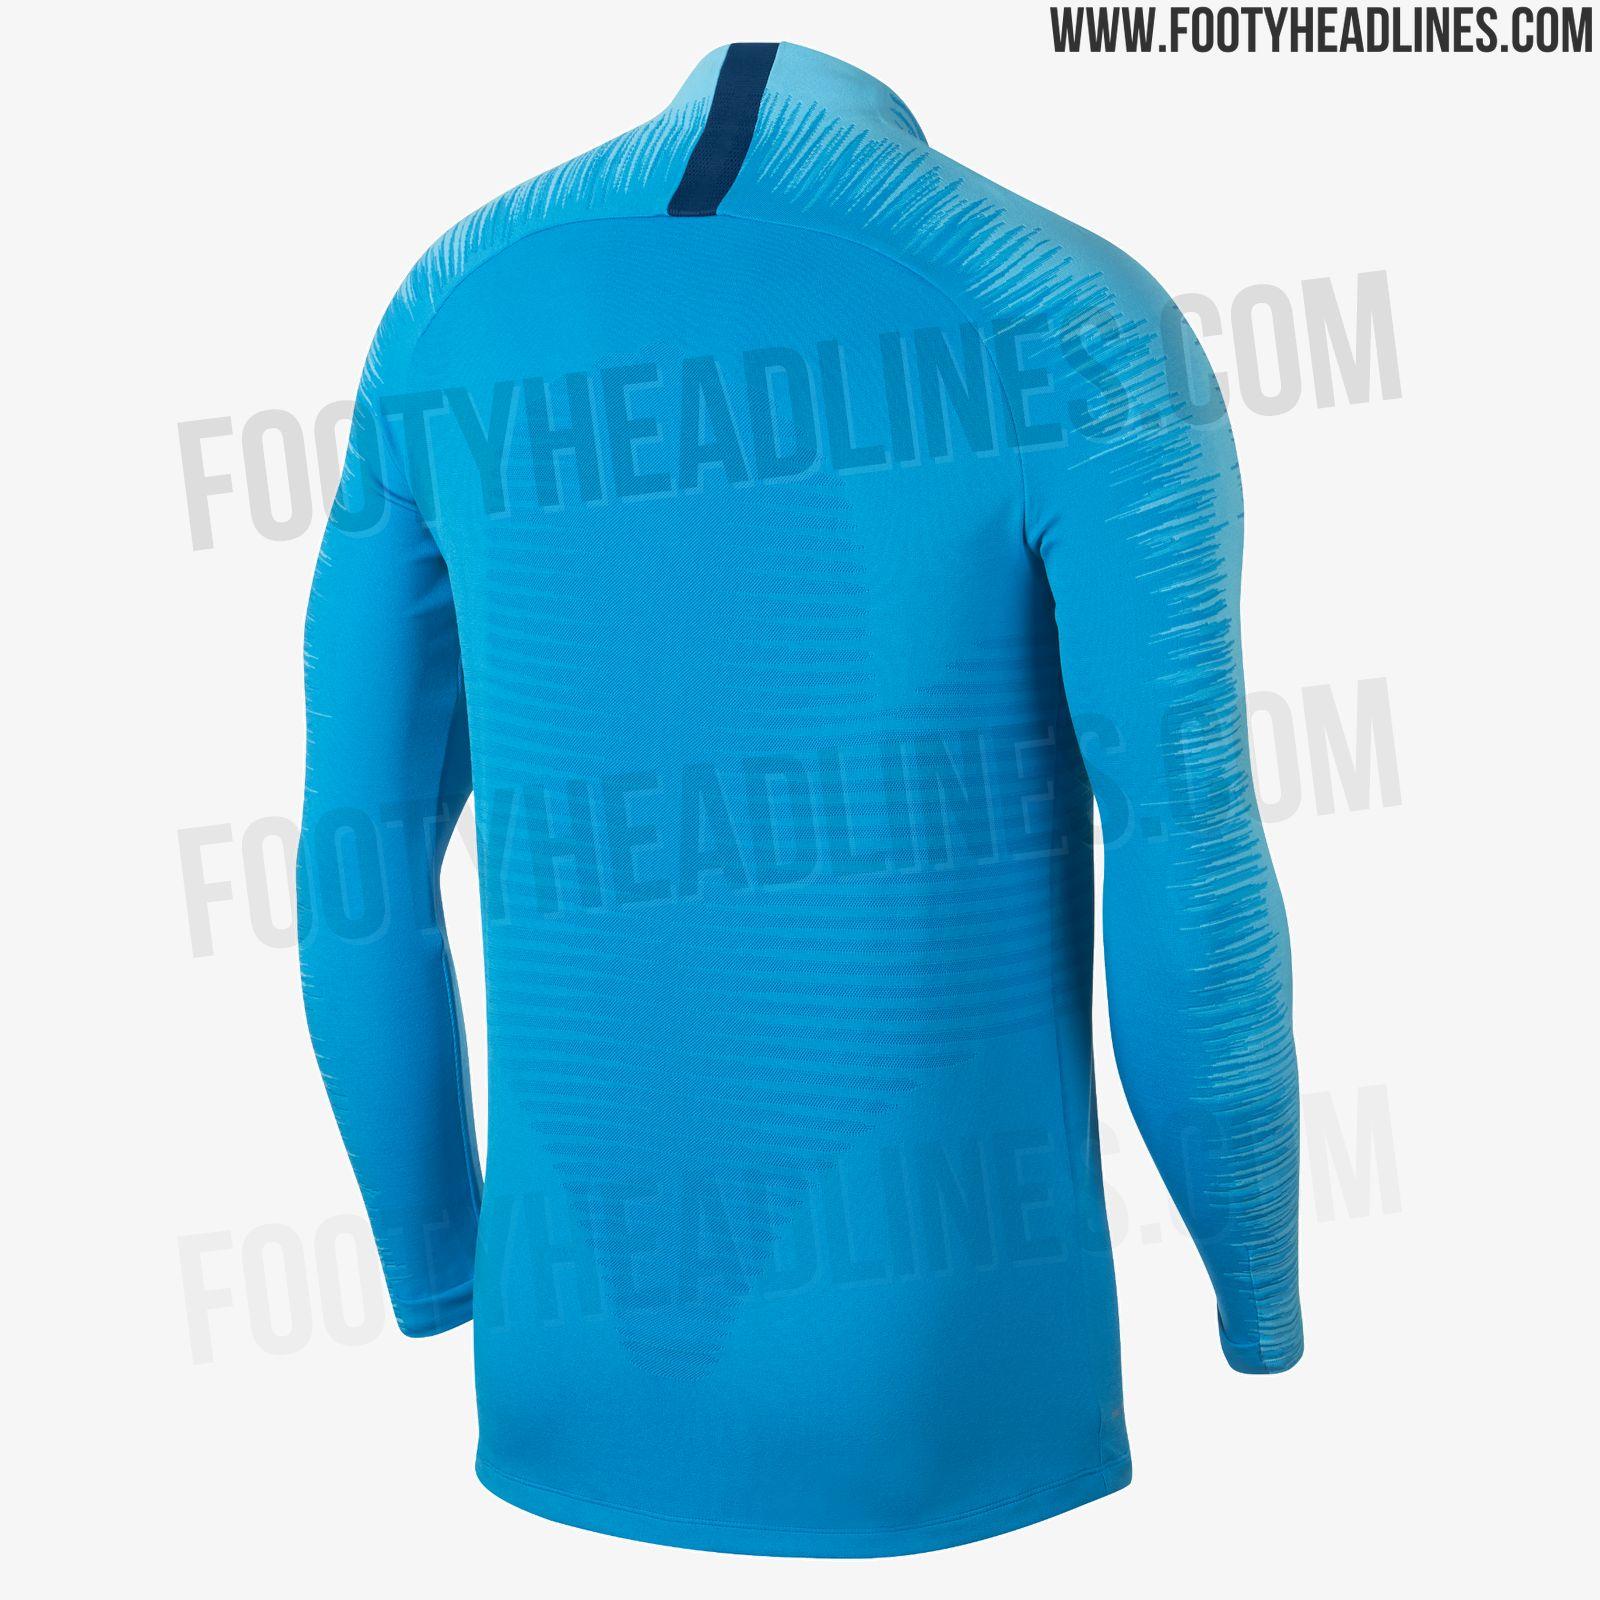 new product 17ba3 c764d NEW Template: Nike Barcelona 2019 Training Kit Leaked ...